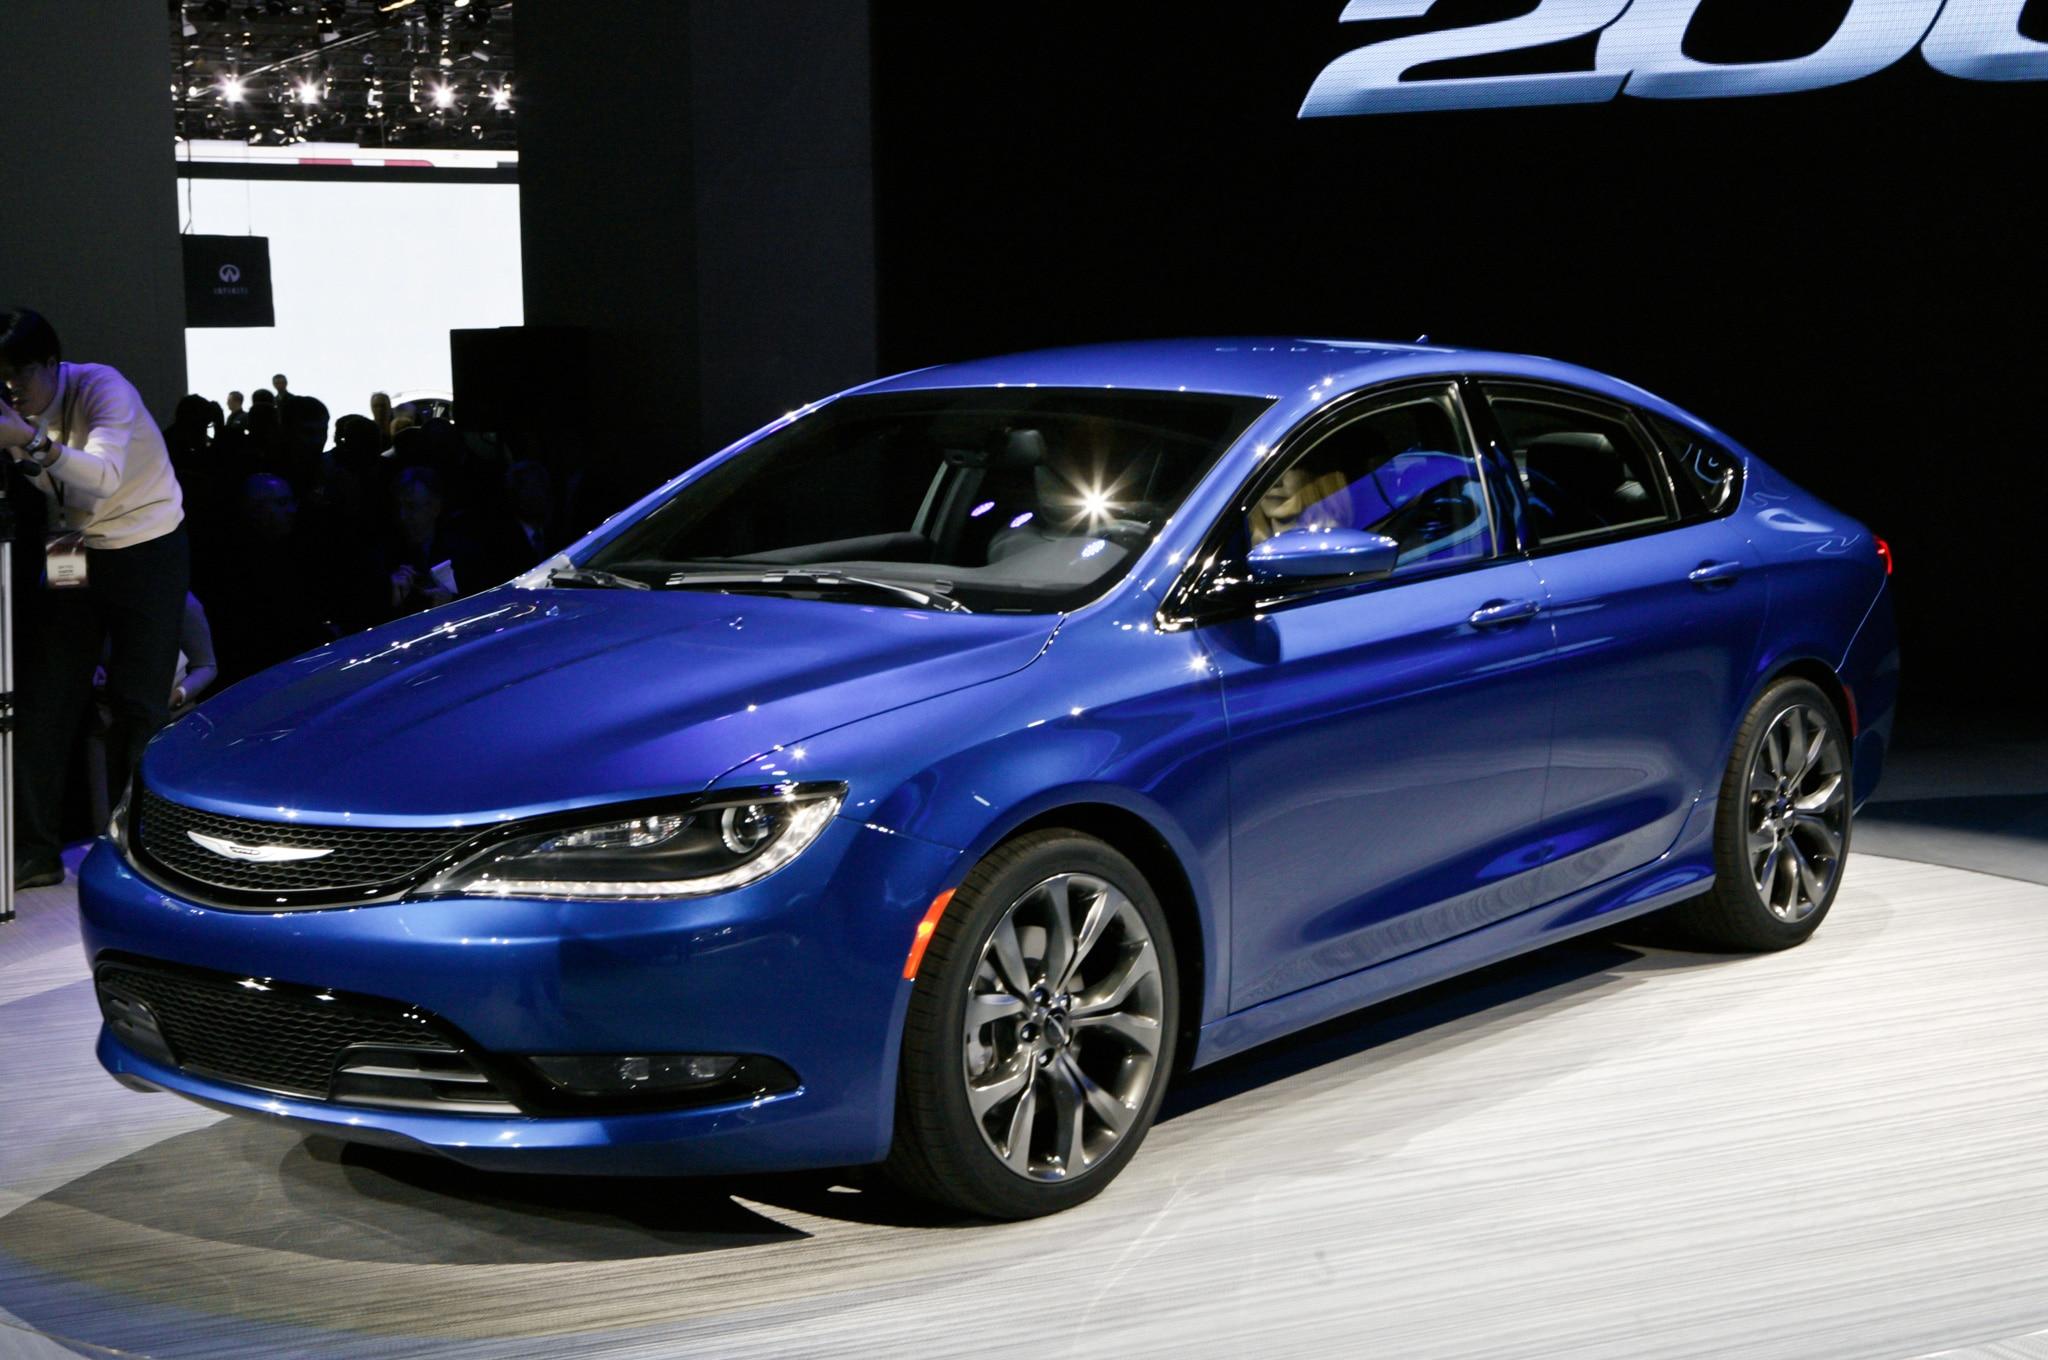 2015 Chrysler 200 In Detroit Front Side View Blue1